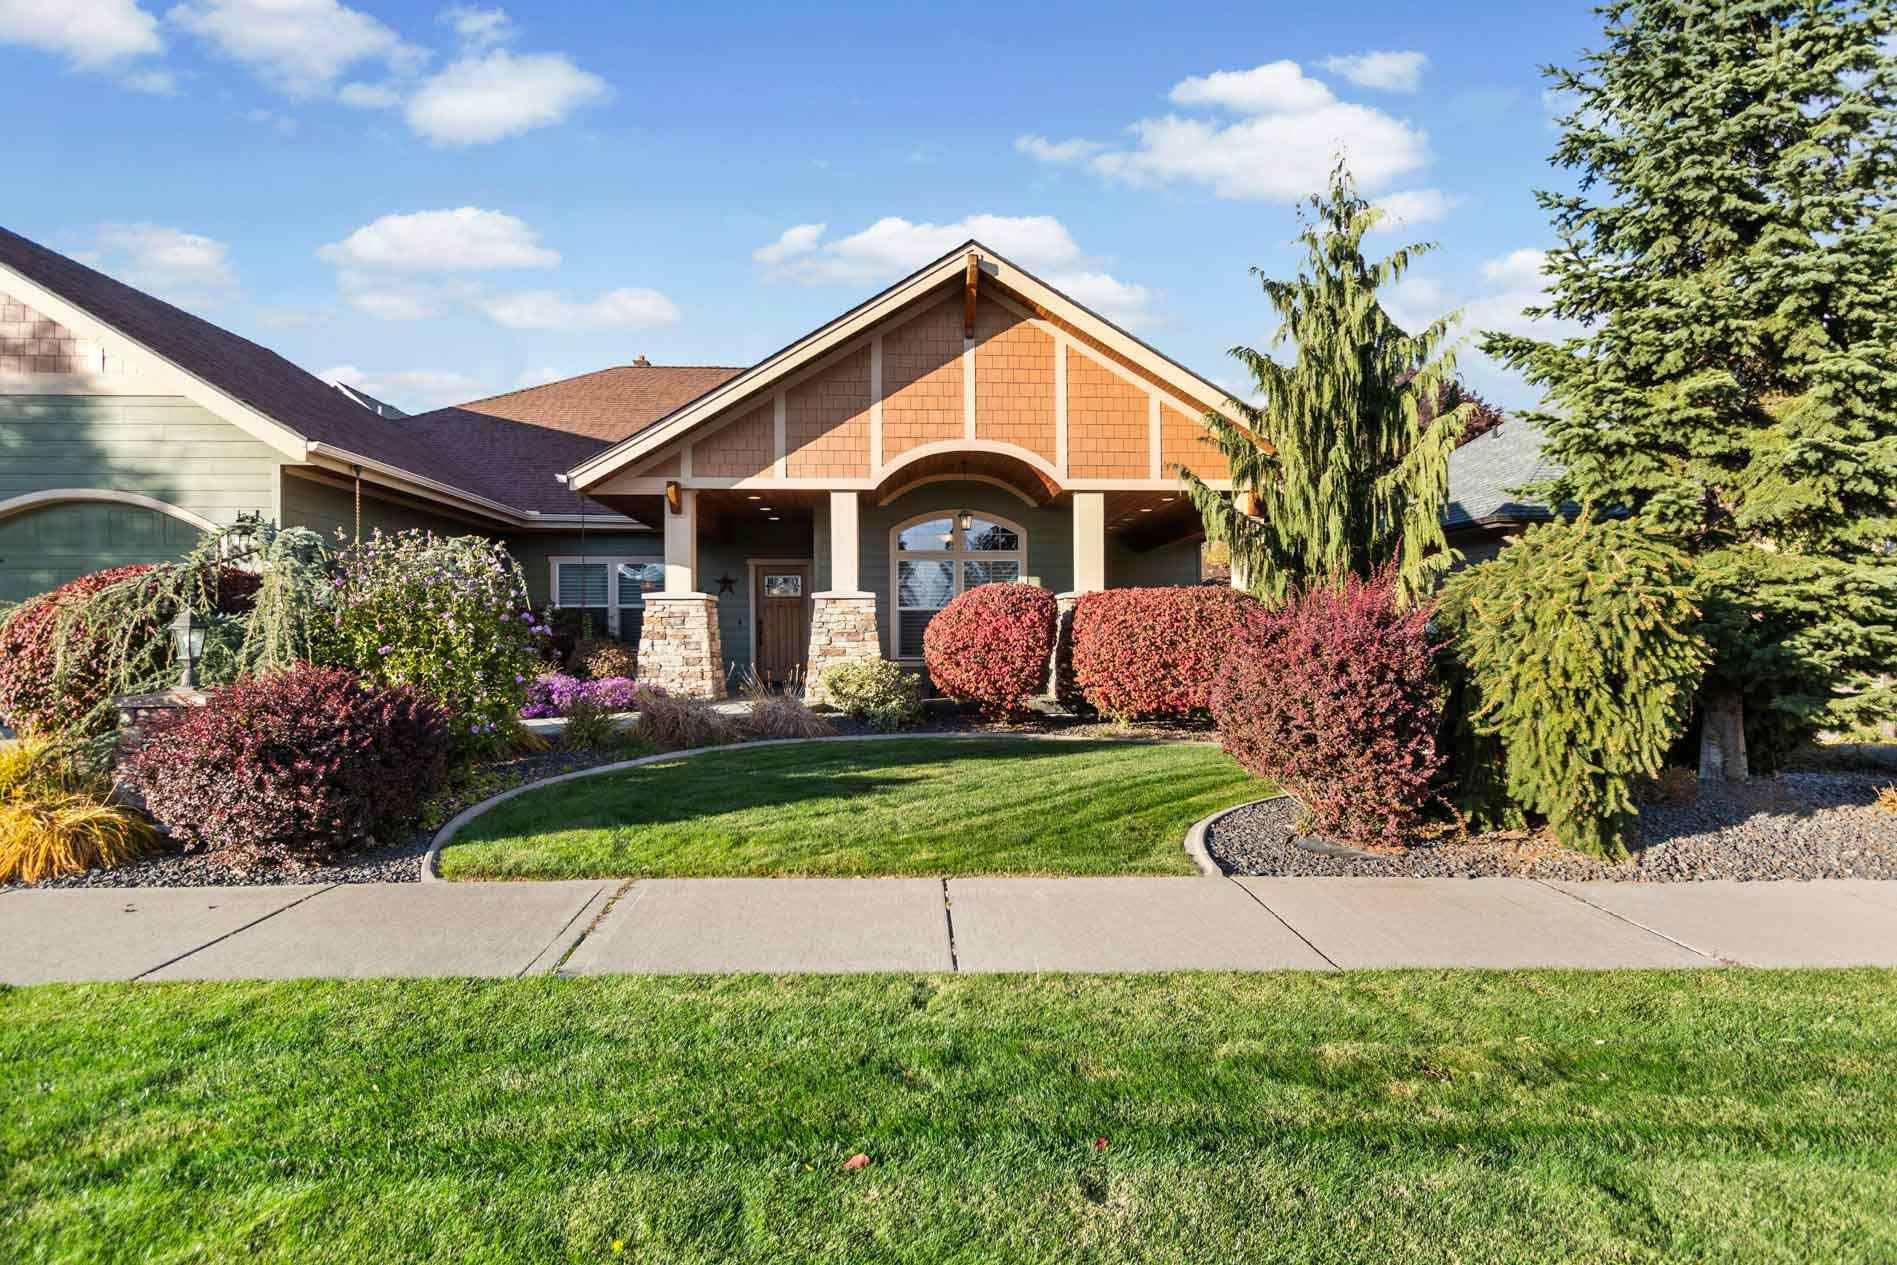 2308 W Stratton Ave, Spokane, WA 99208-4403 - #: 202119750